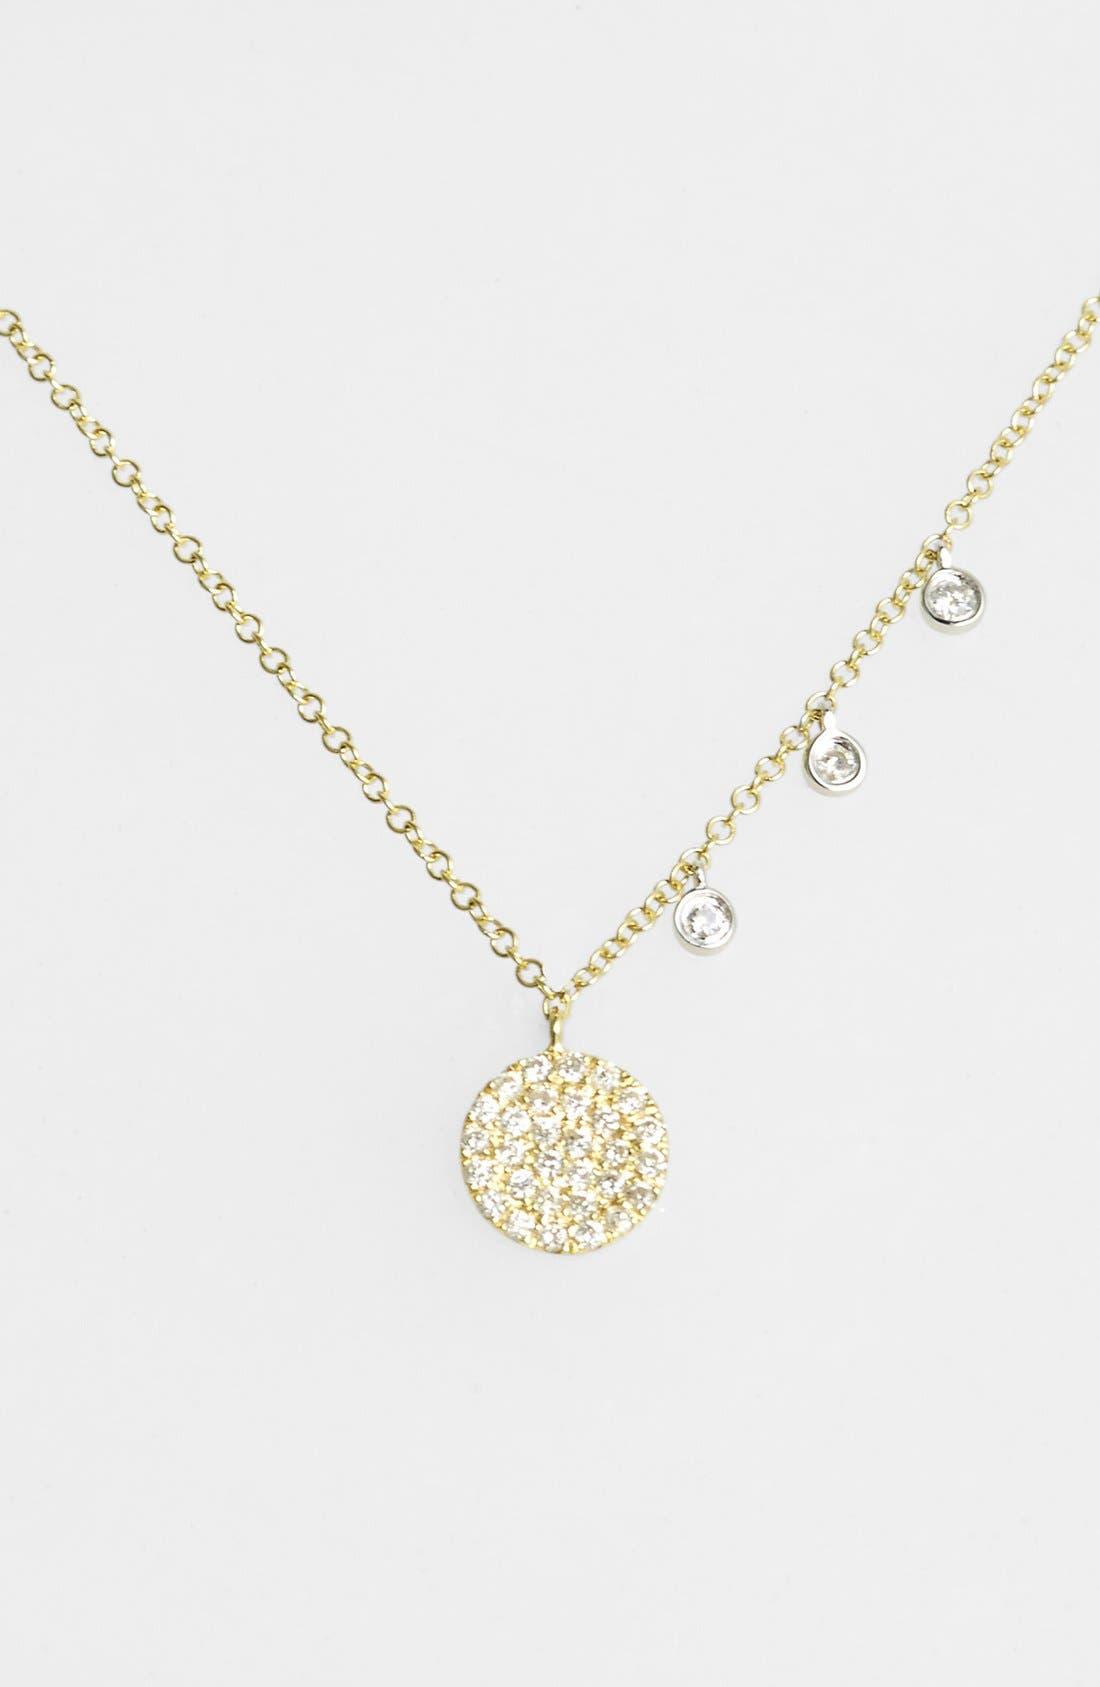 Dazzling Diamond Disc Pendant Necklace,                             Main thumbnail 1, color,                             YELLOW GOLD